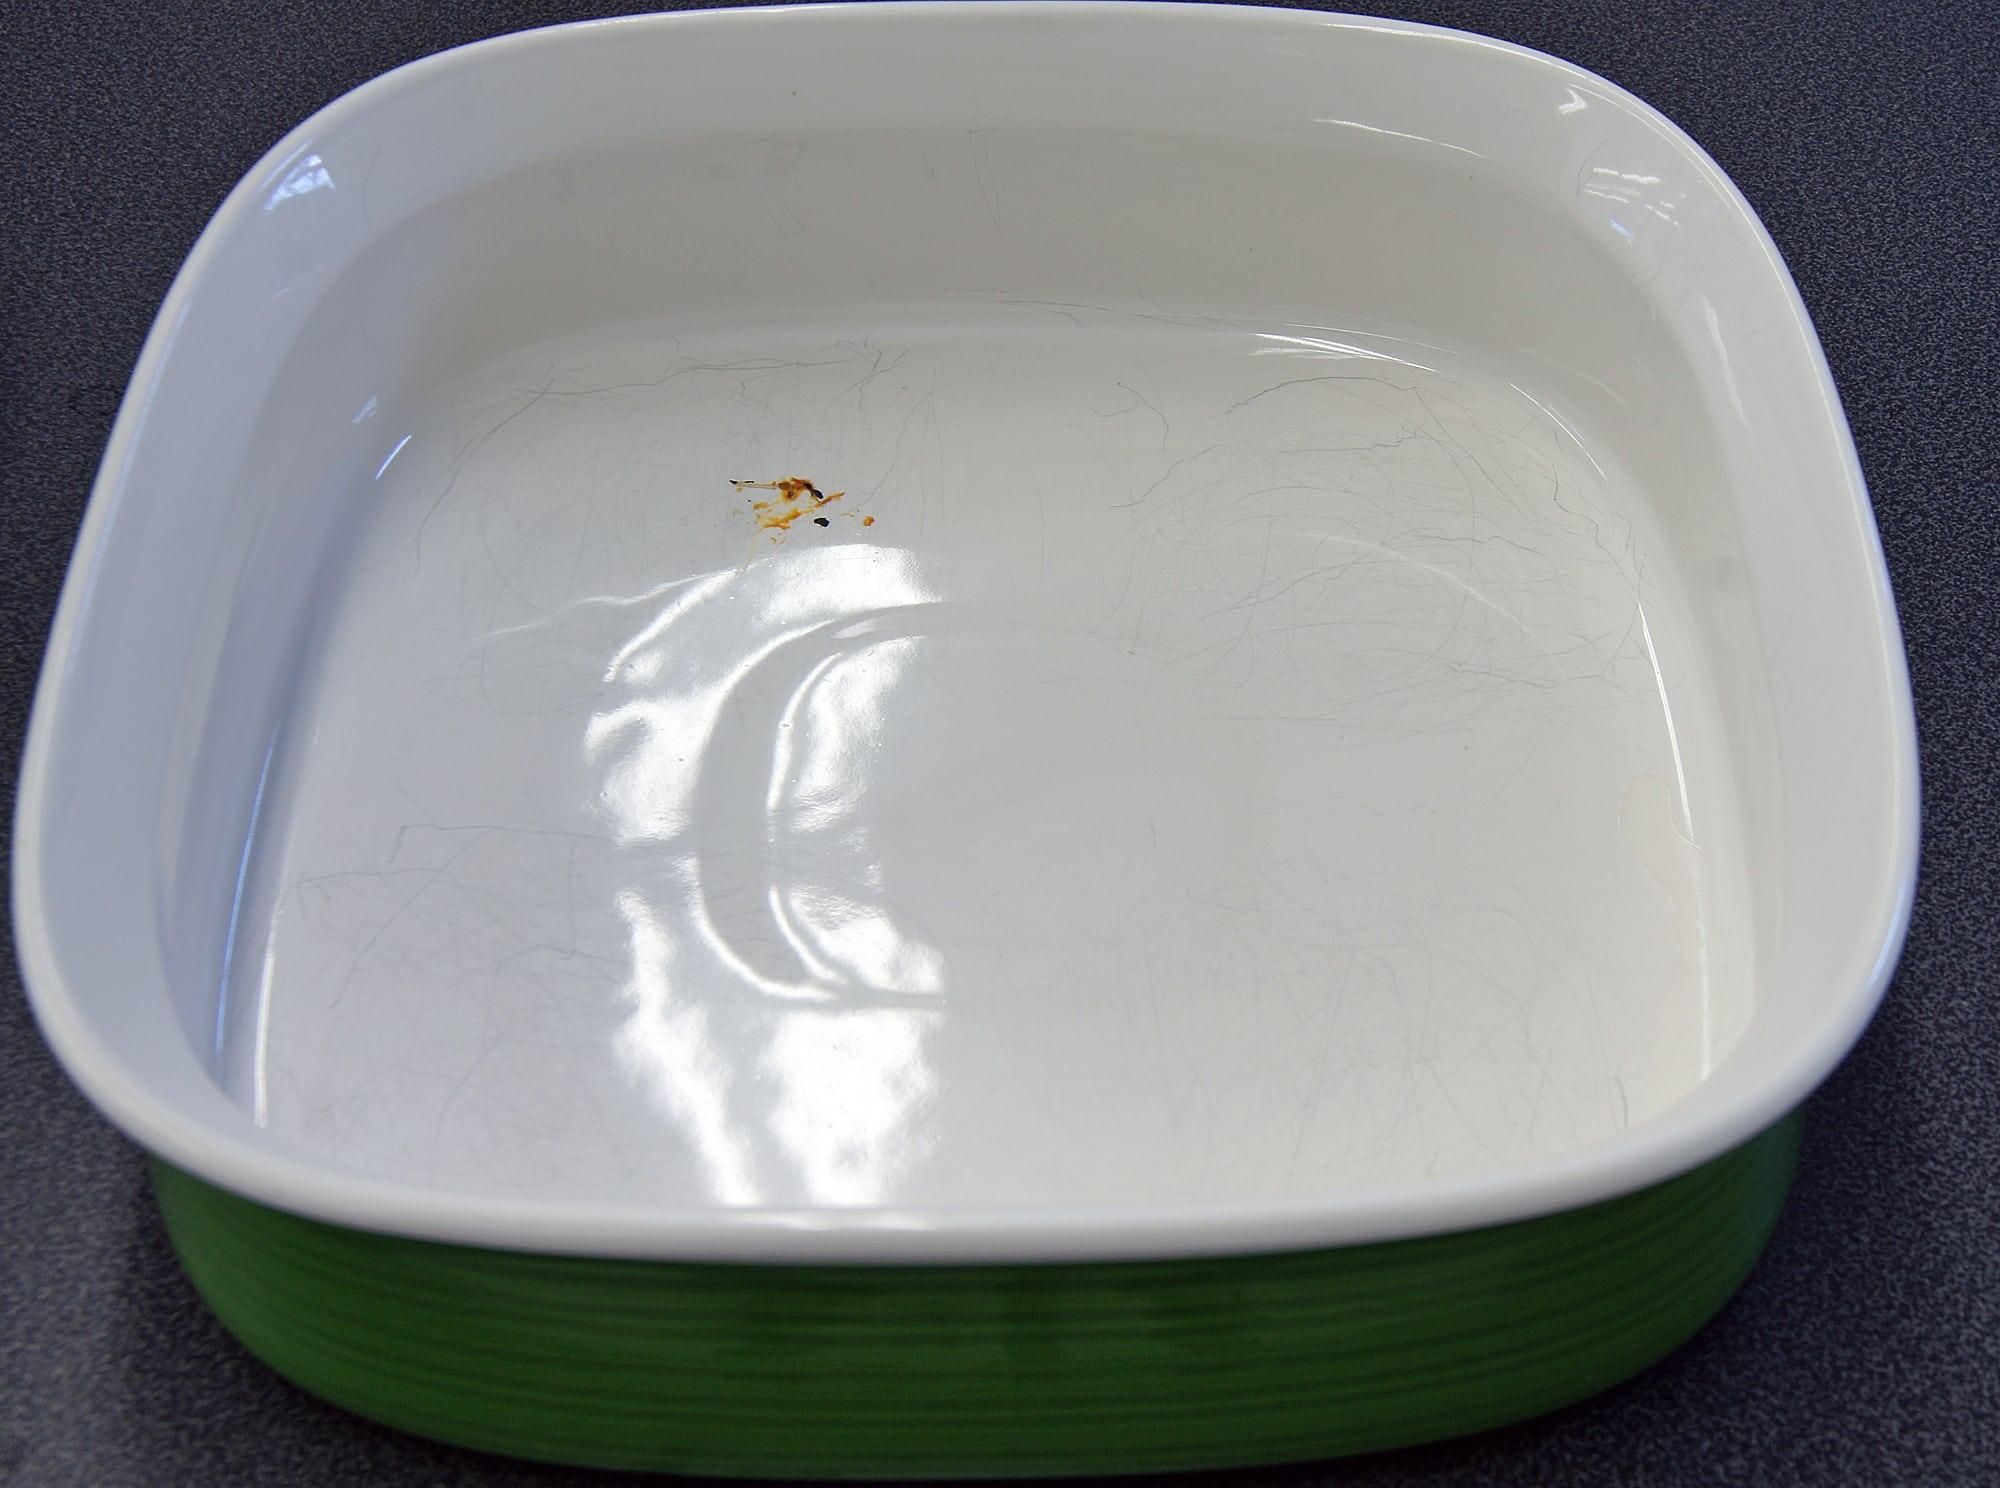 Whirlpool WDF530PAYM lasagna stain